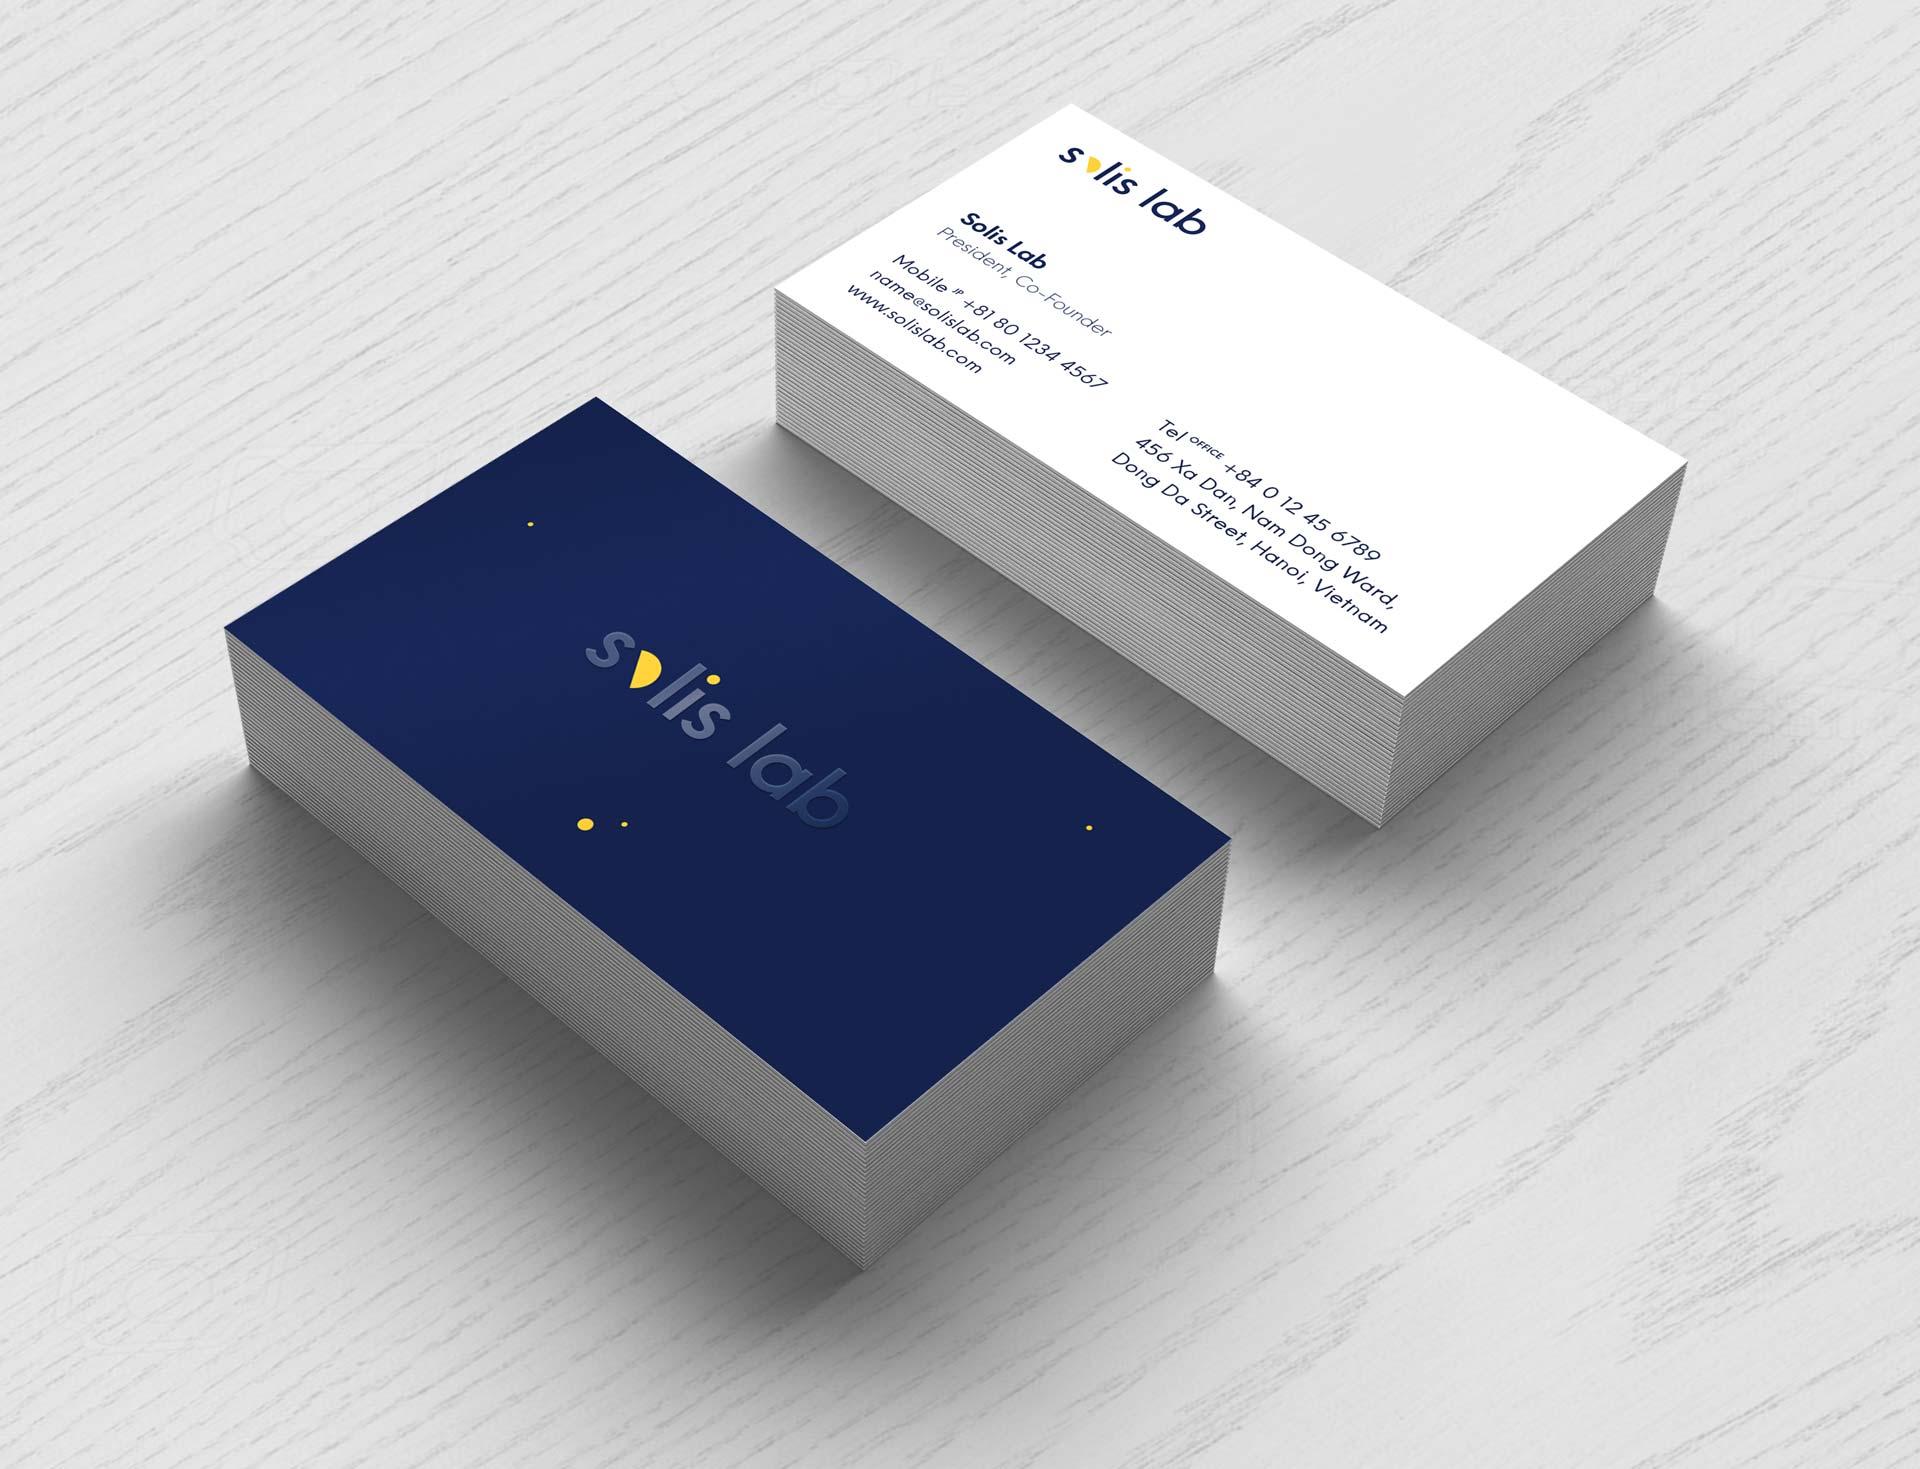 solis lab - business card design